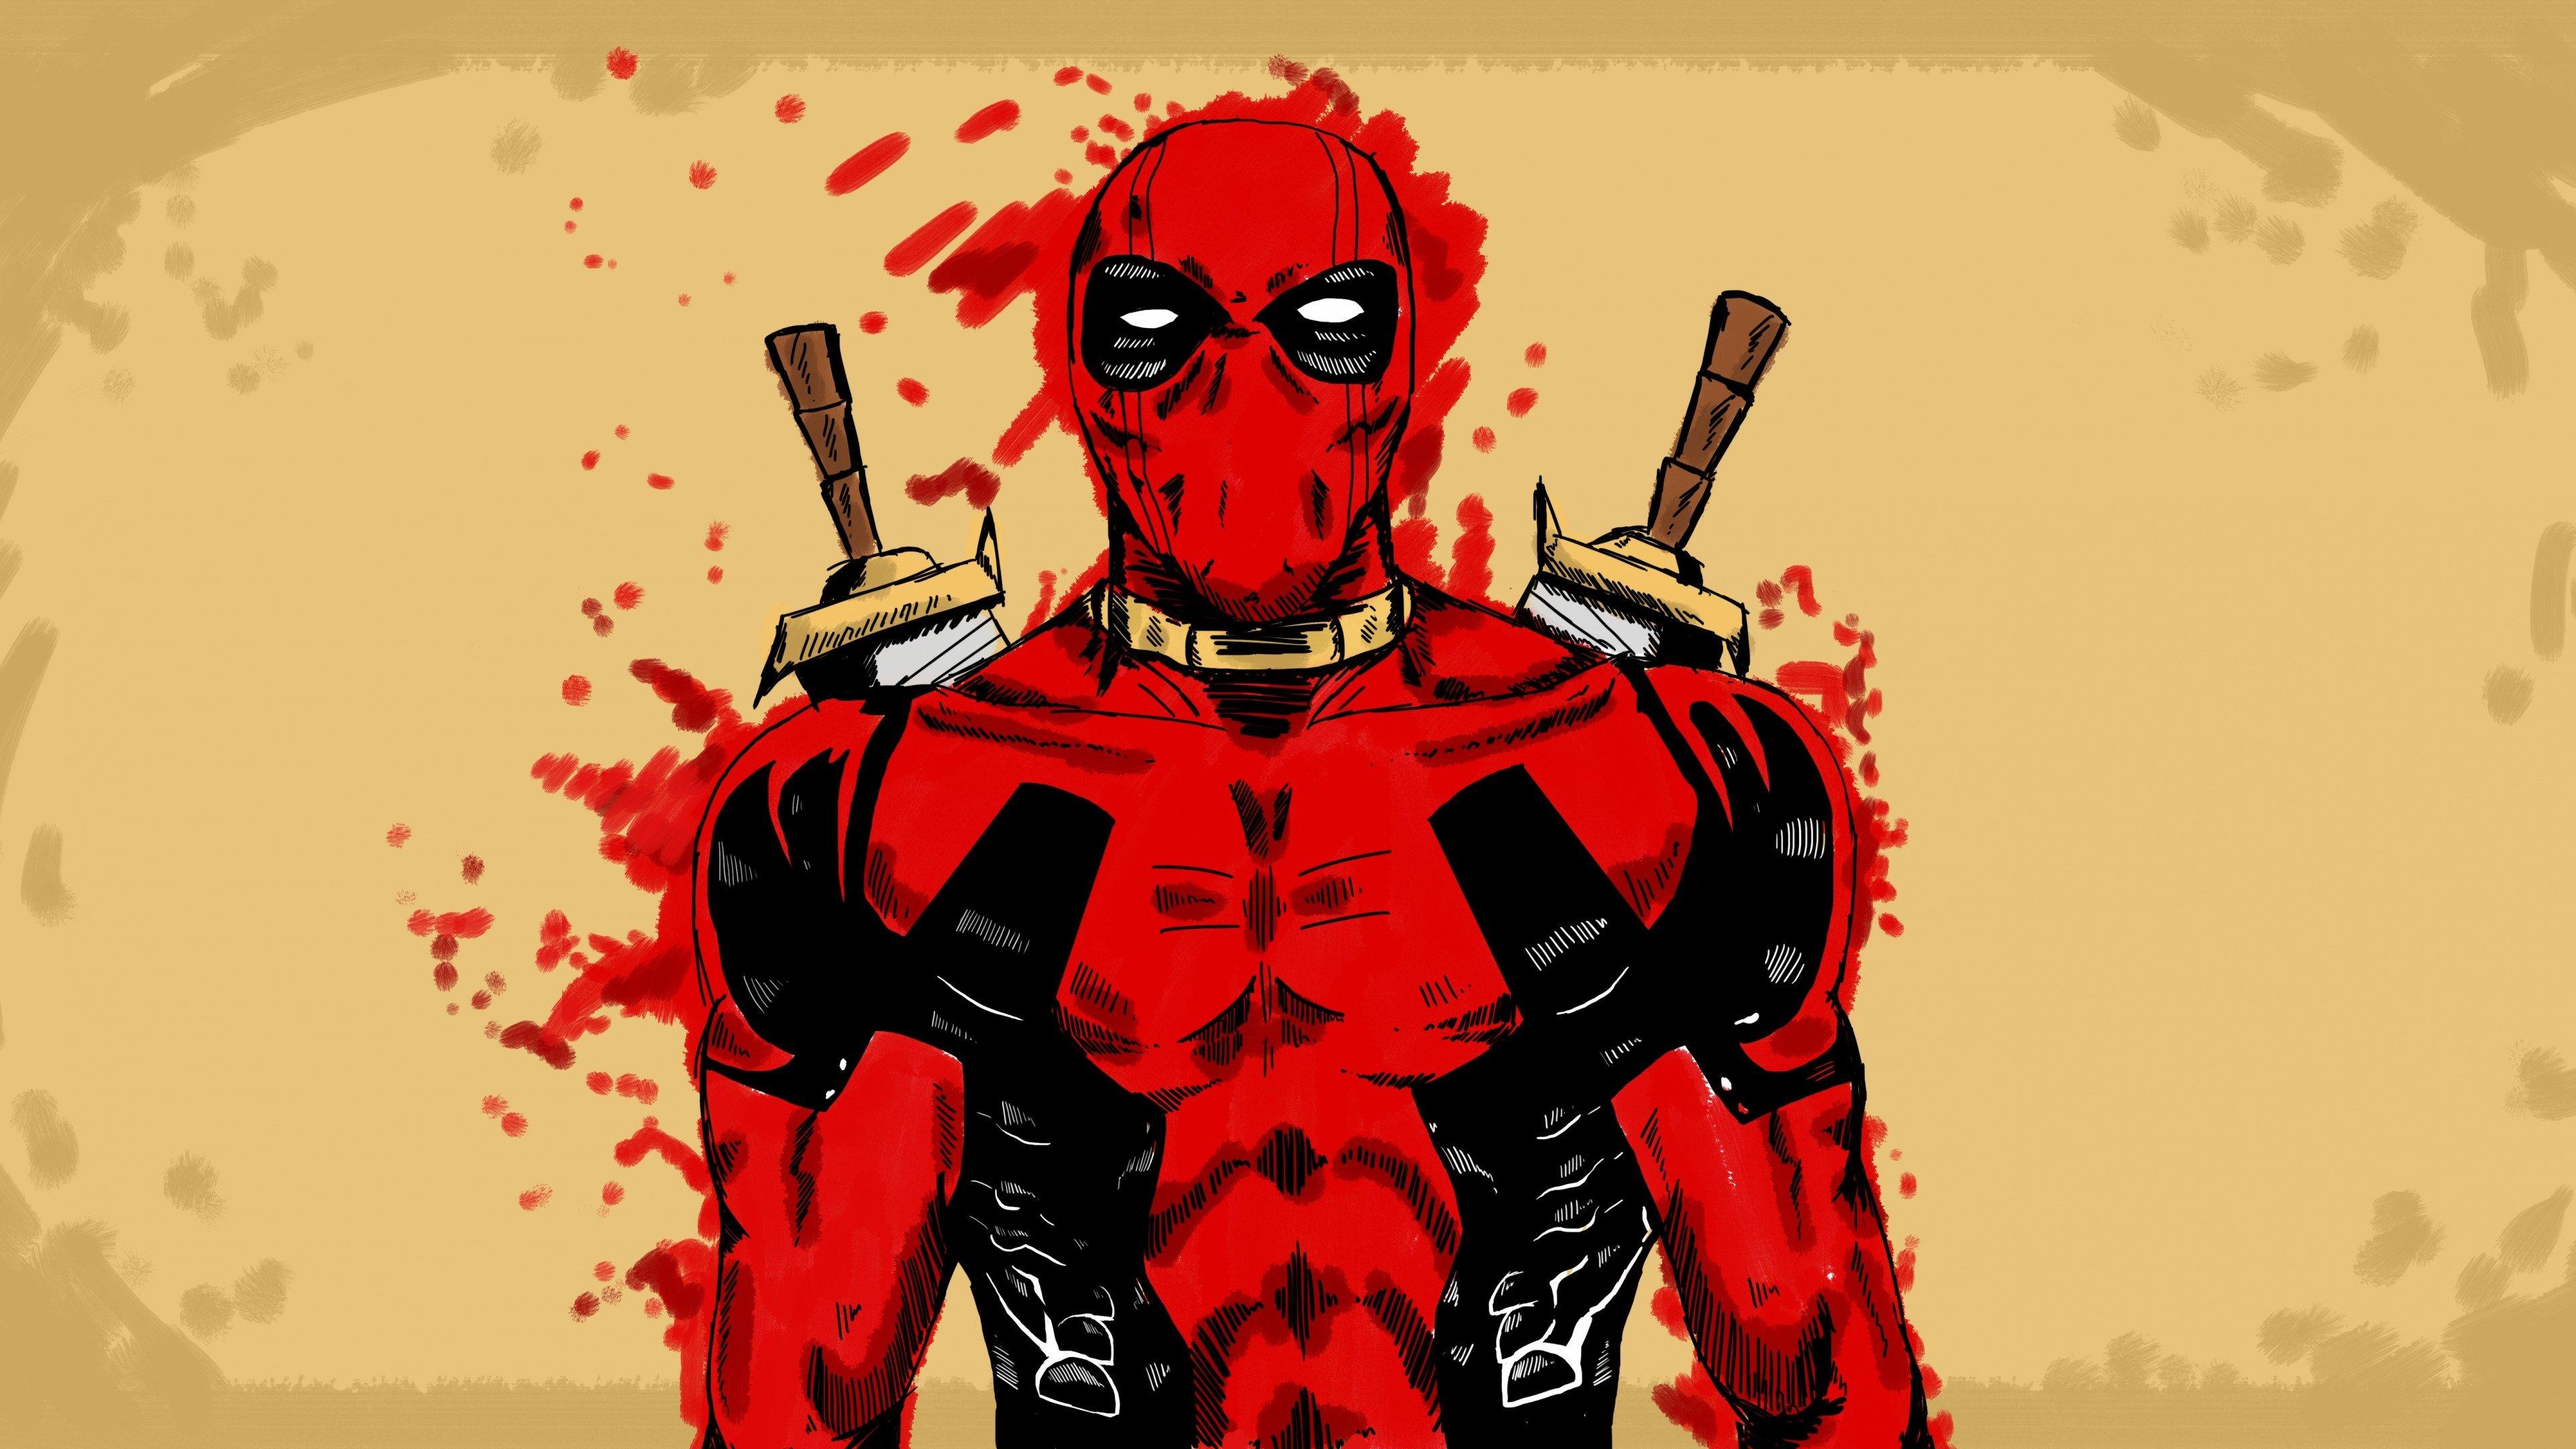 Fondo de pantalla de Artwork de Deadpool Imágenes